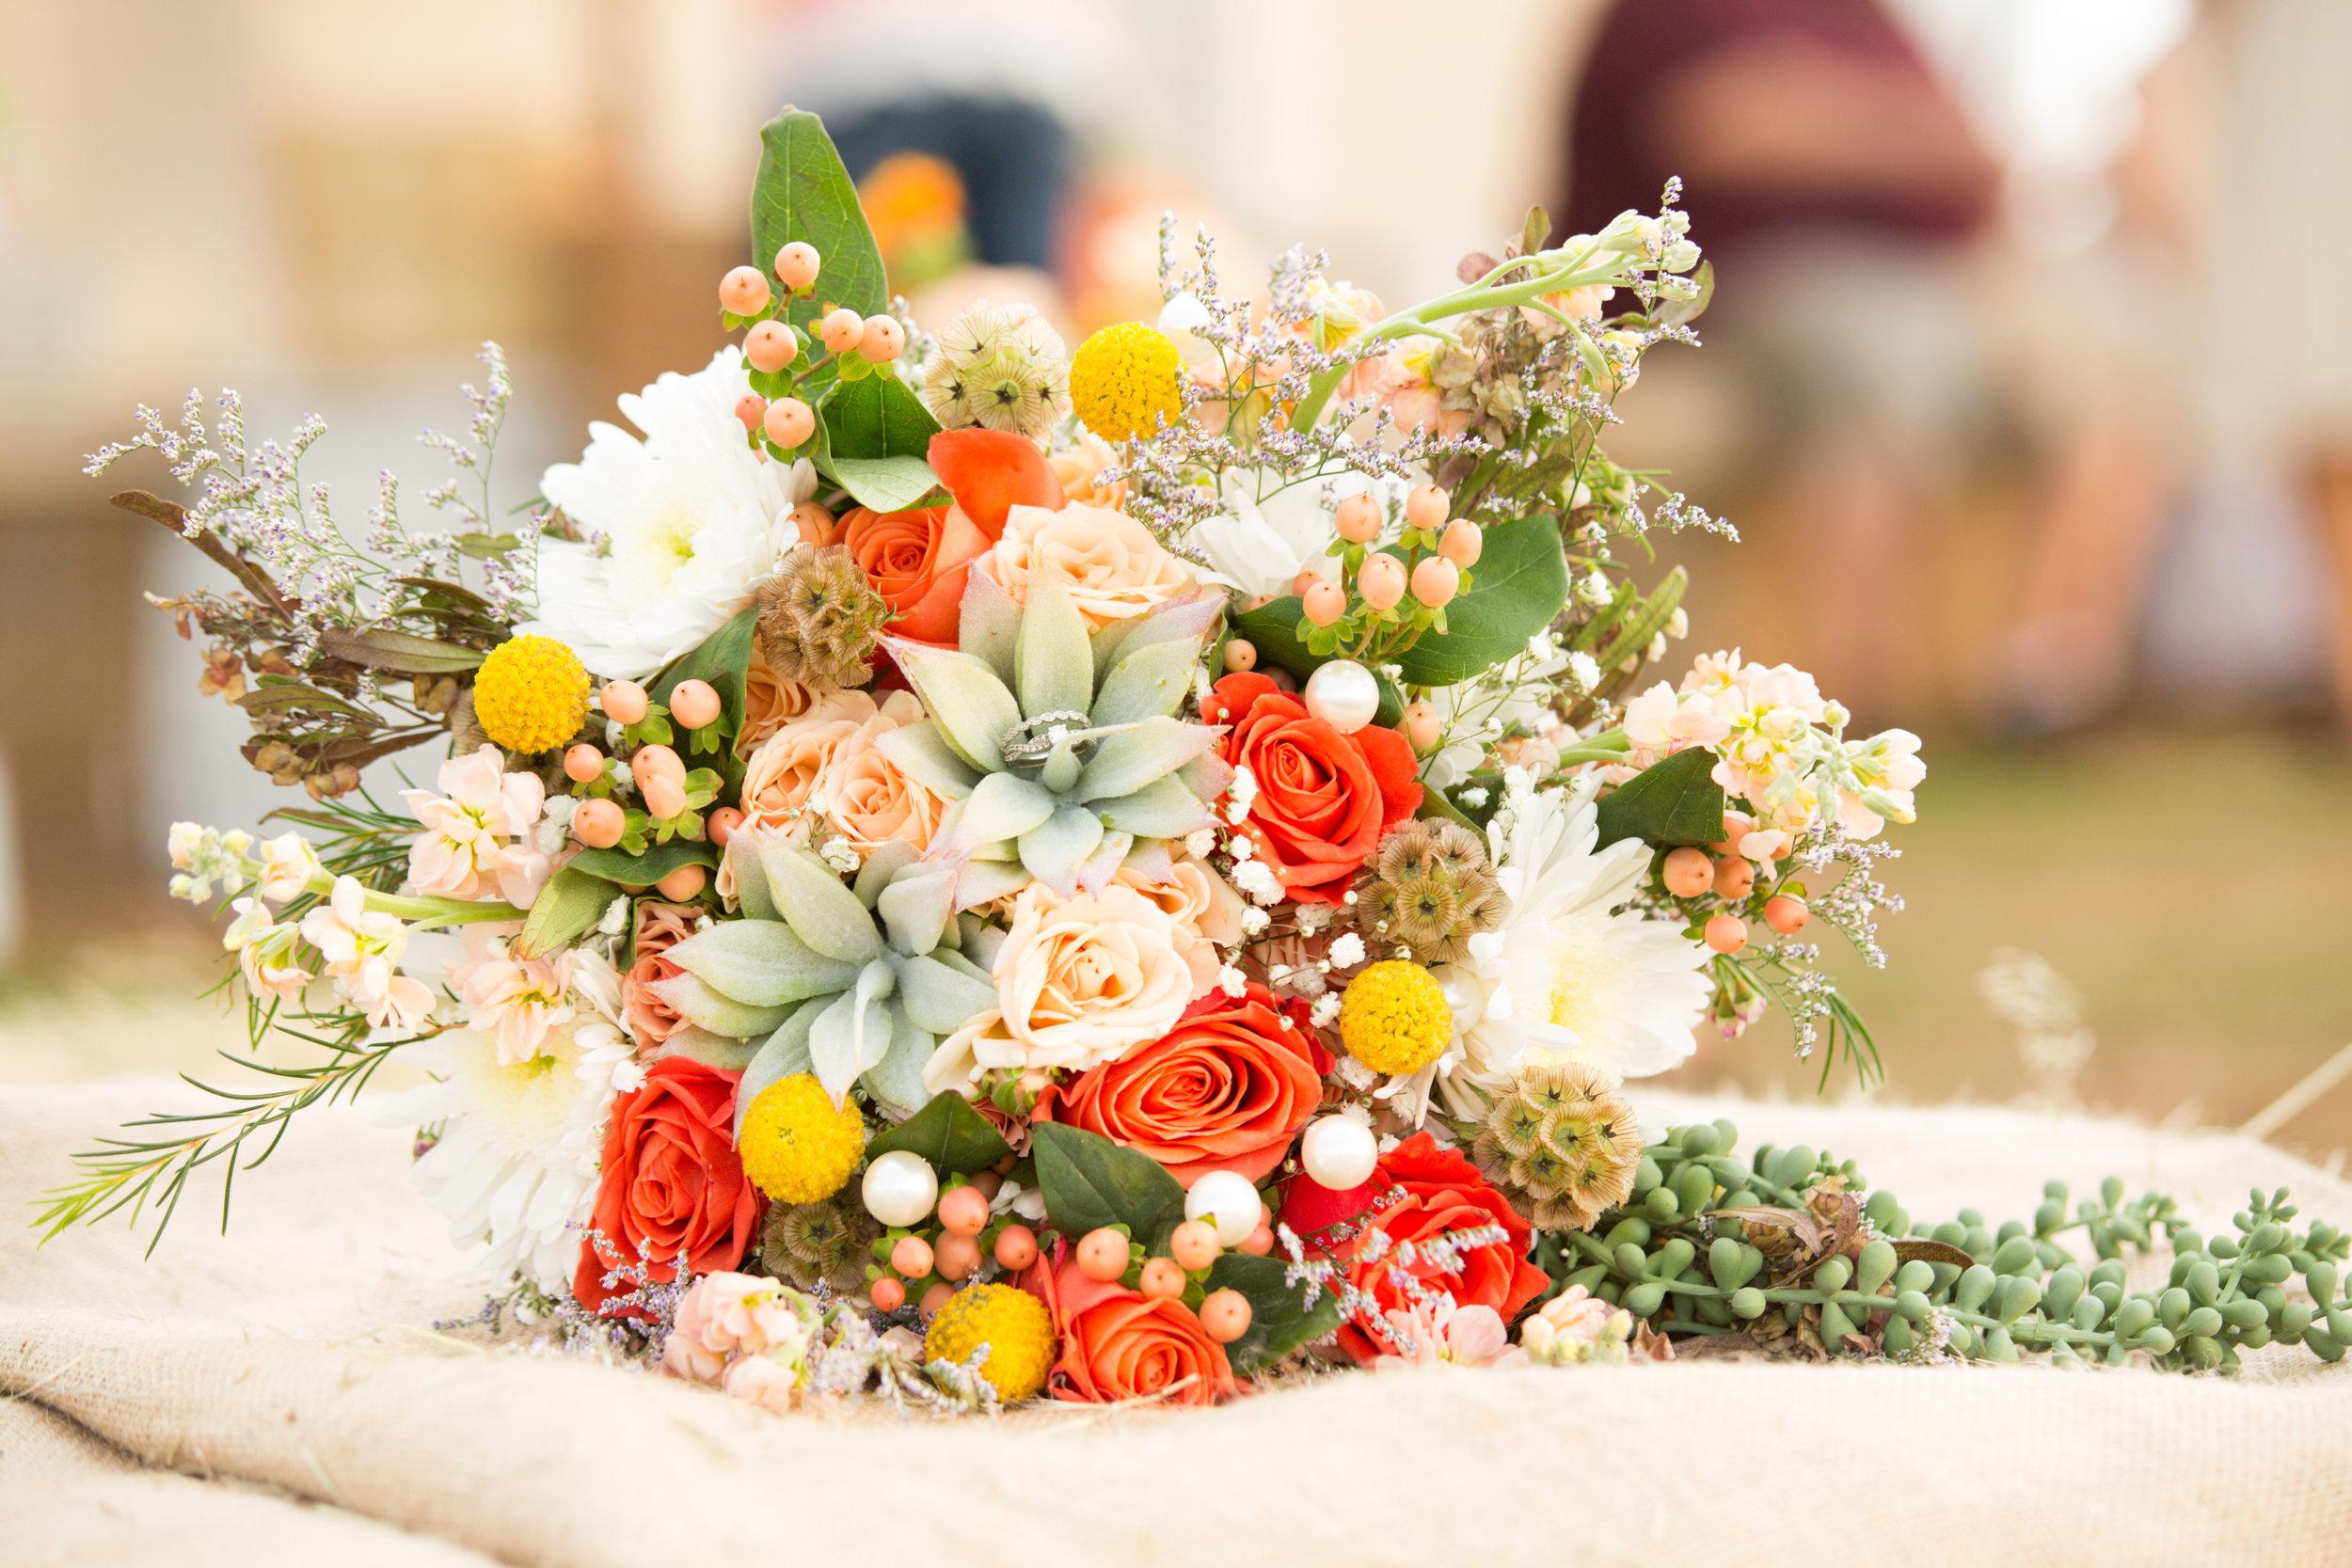 Flowers by Kimber Hendrickson; Photo by Katie Powers